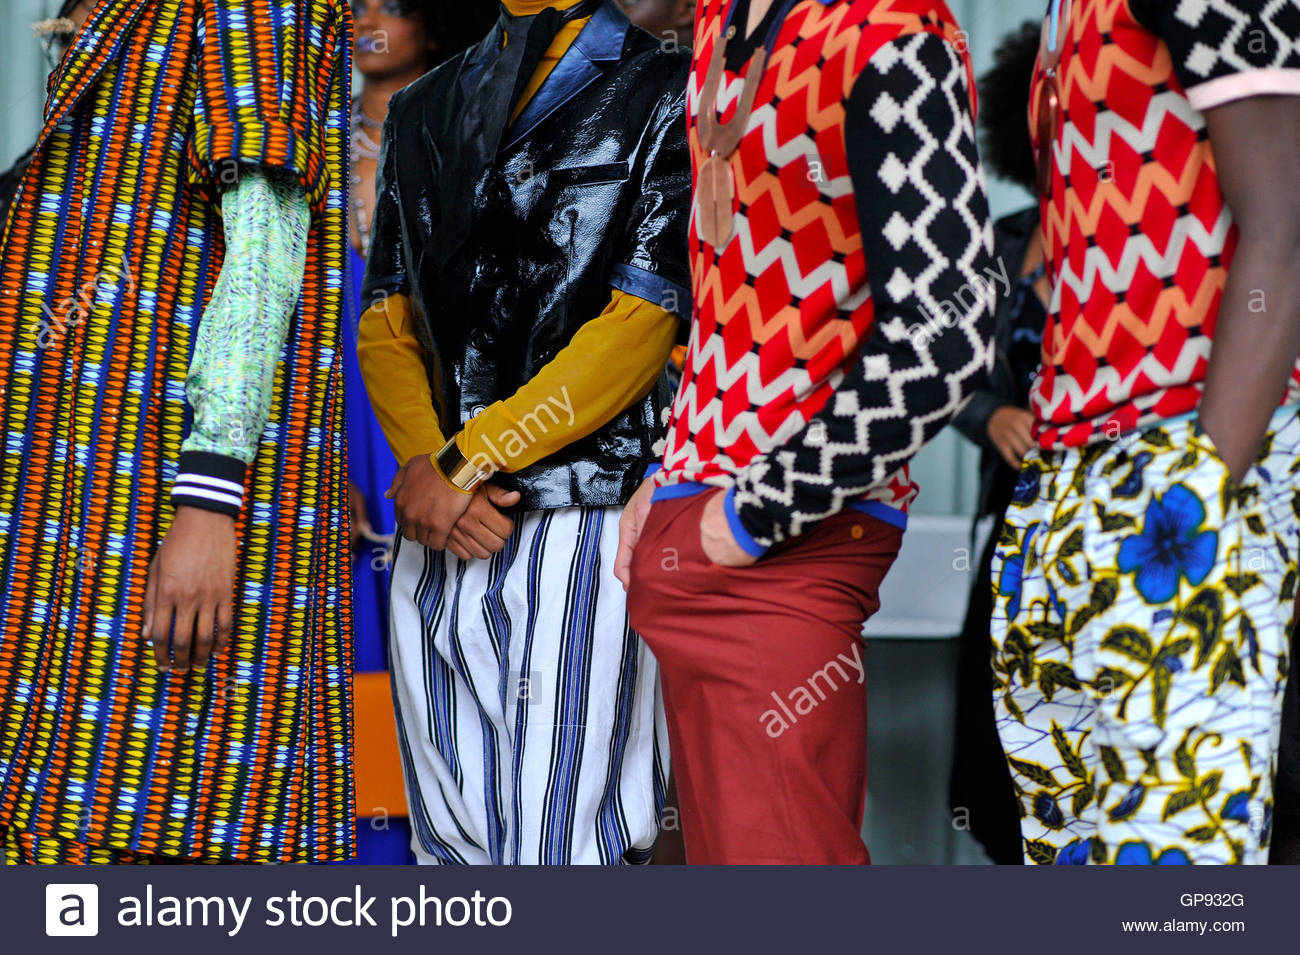 Details of models backstage at Africa Utopia Fashion Event Southbank London, England UK September 3 2016. Credit: - Stock Image